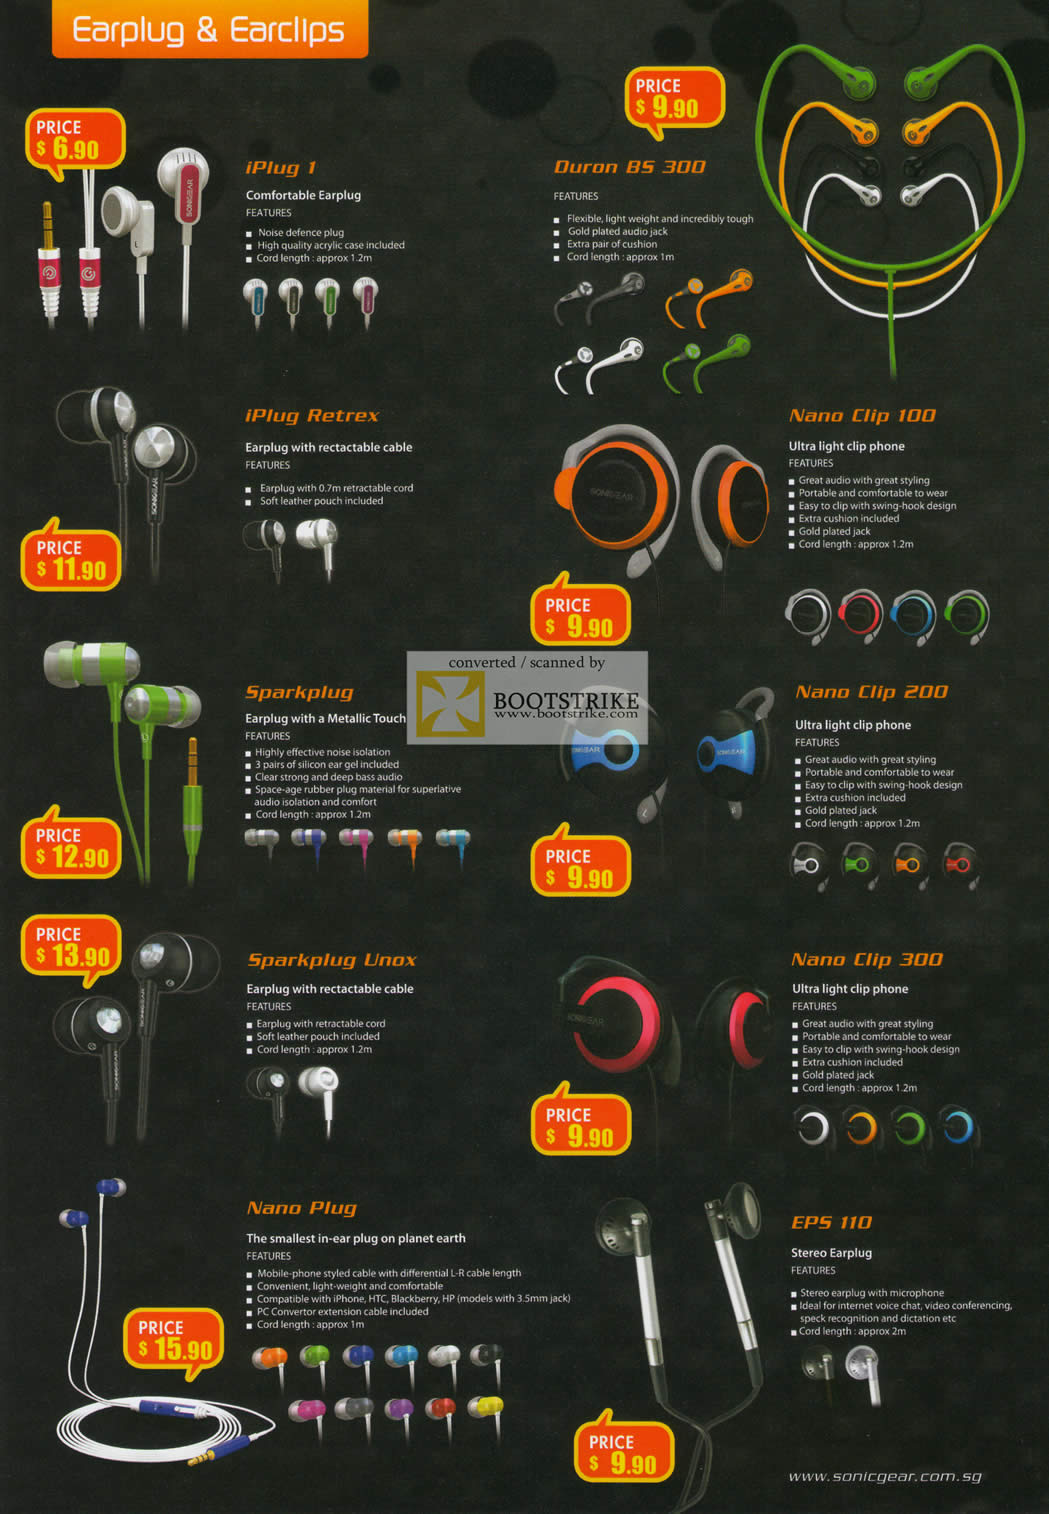 IT Show 2011 price list image brochure of Leapfrog Sonicgear Earphones IPlug 1 Duron BS 300 Retrex Nano Clip 100 Sparkplug 200 Unox 300 EPS 110